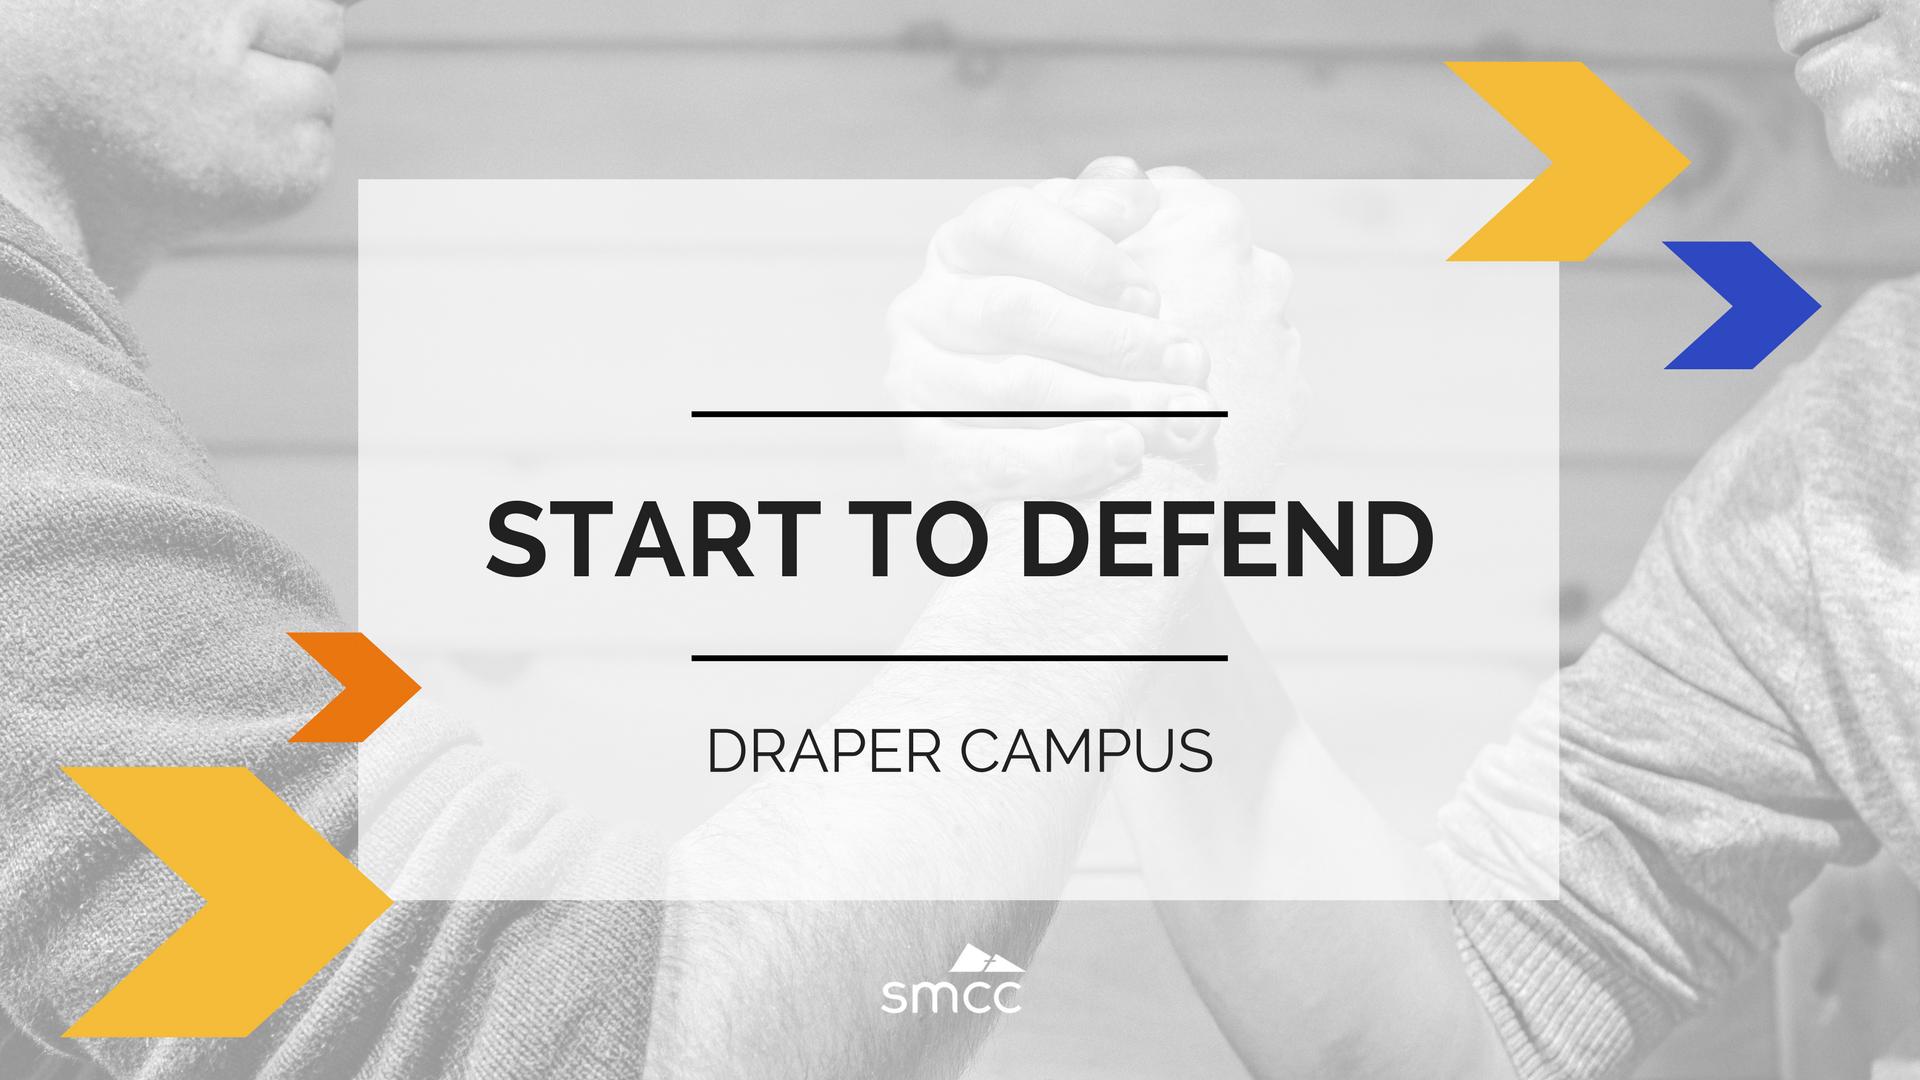 Start to defend presentation